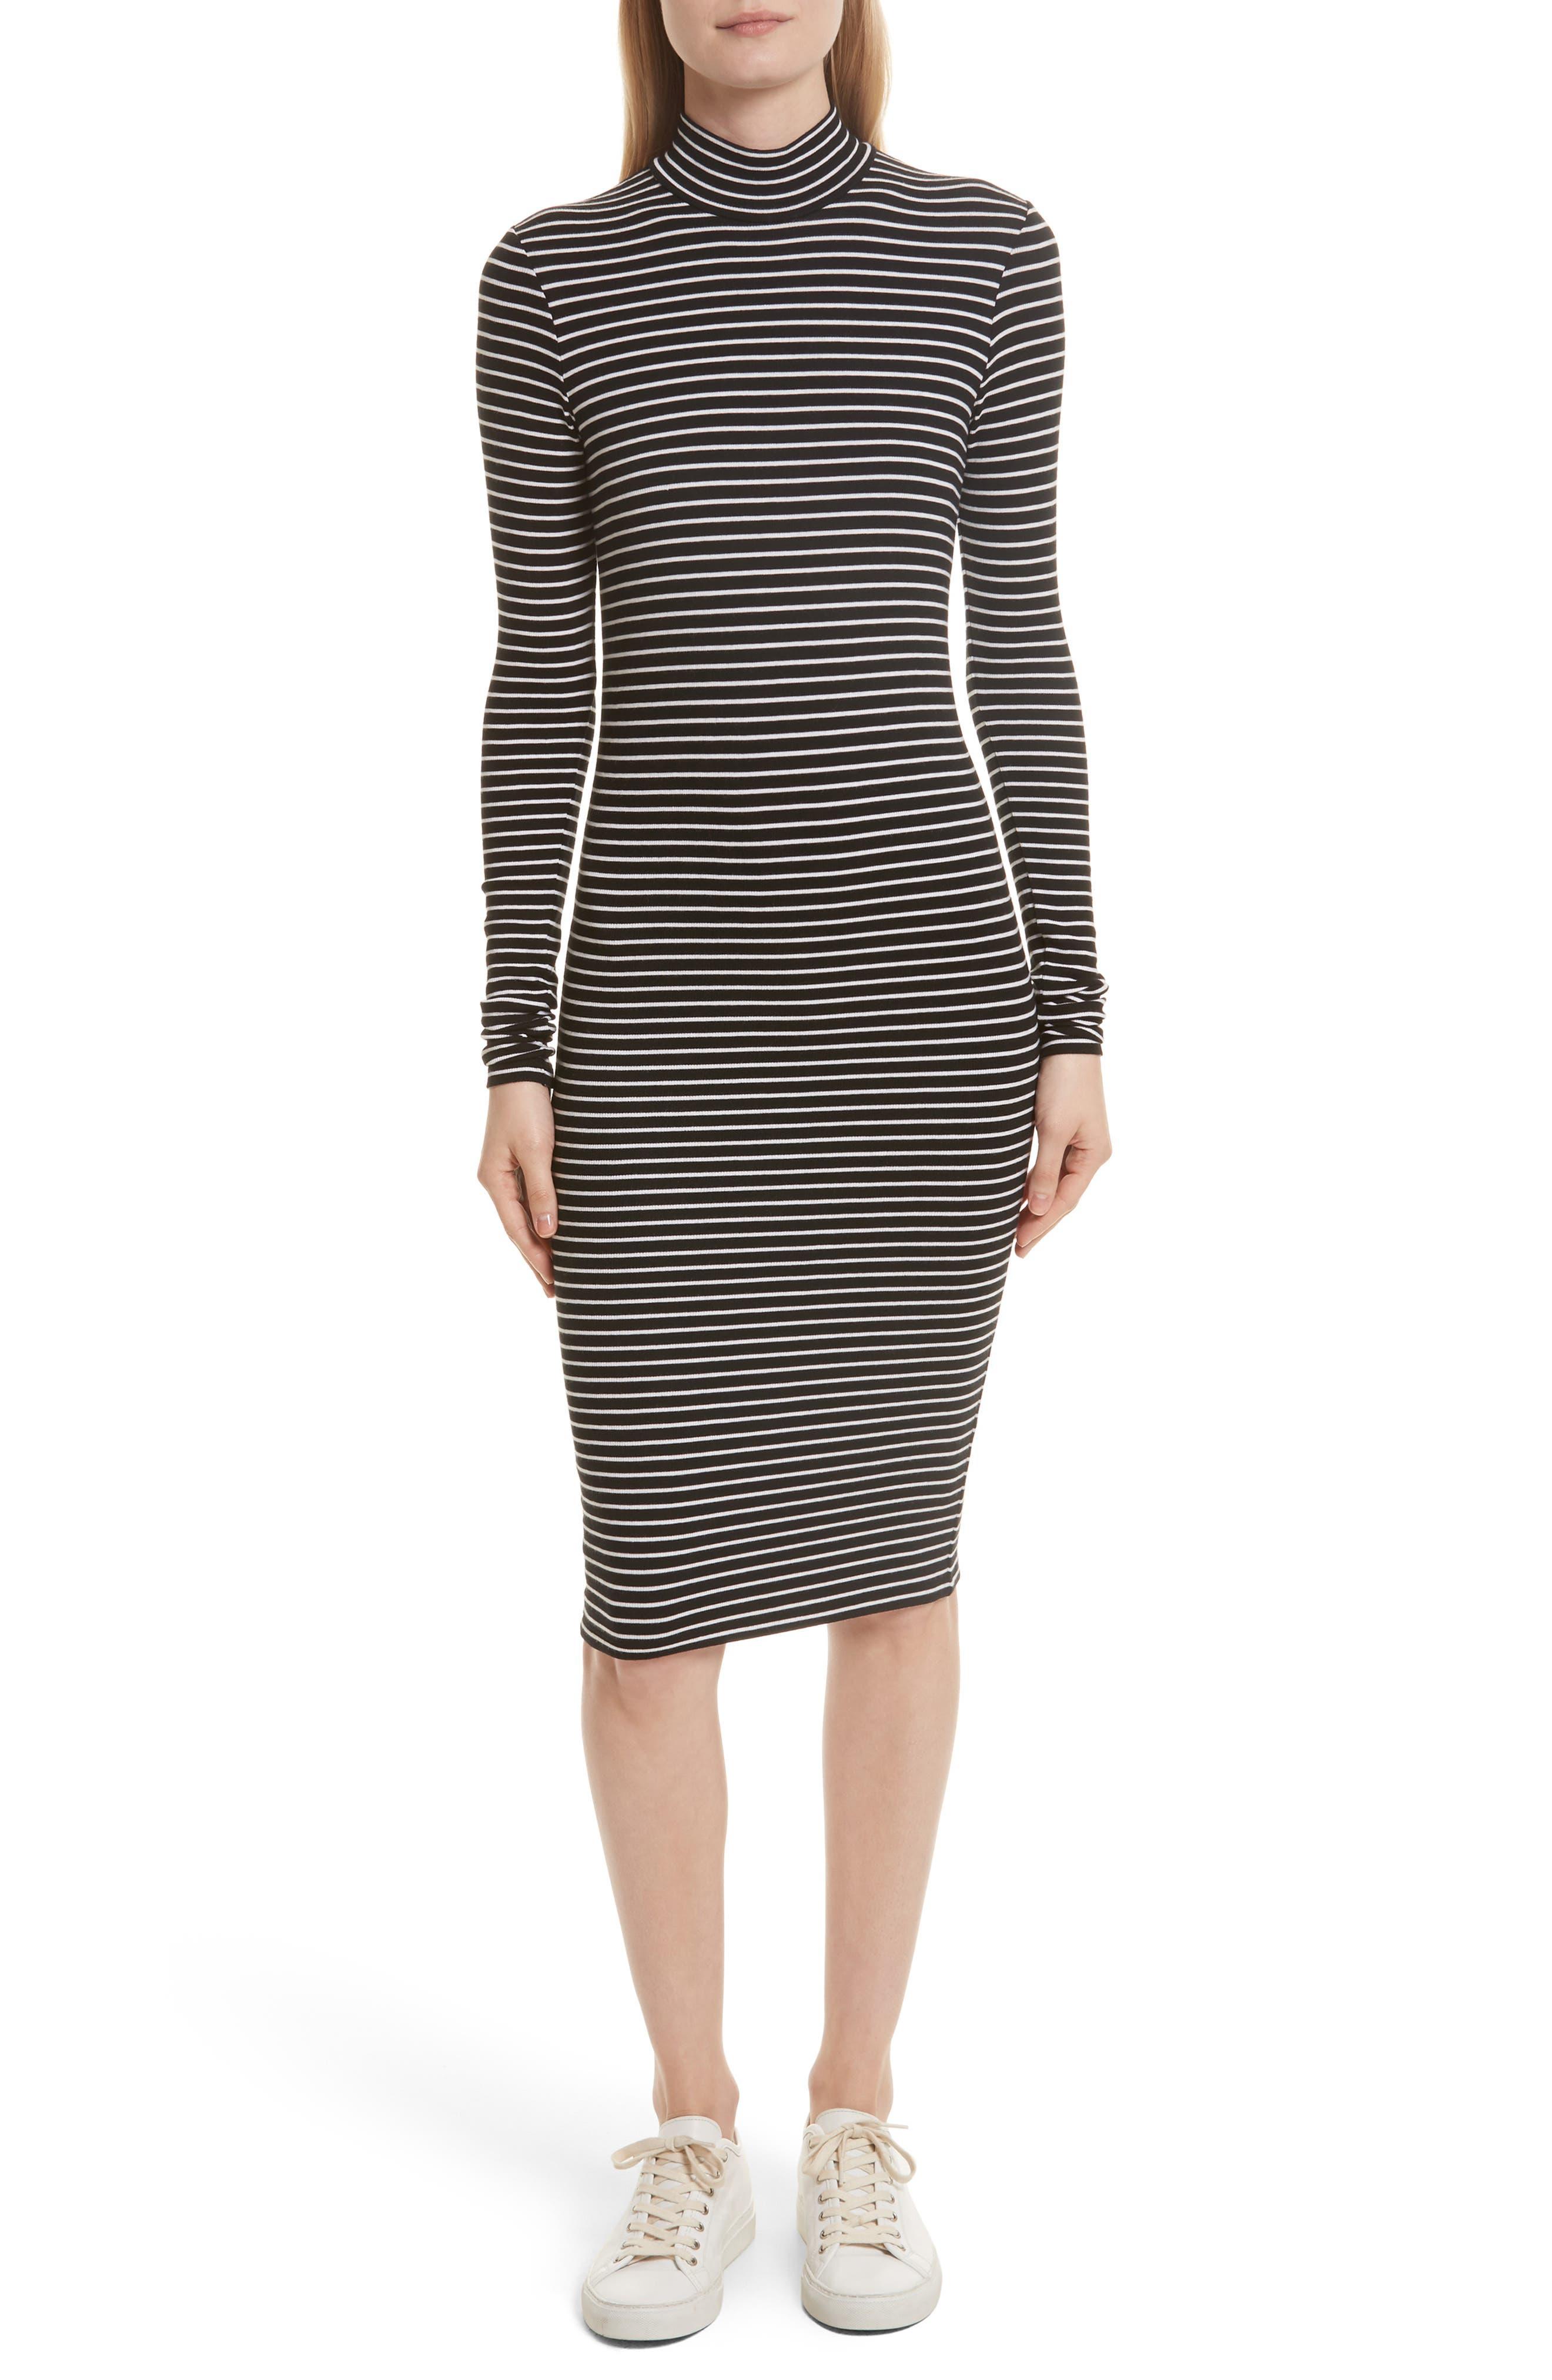 Stripe Rib Jersey Dress,                         Main,                         color, Black/ Whit